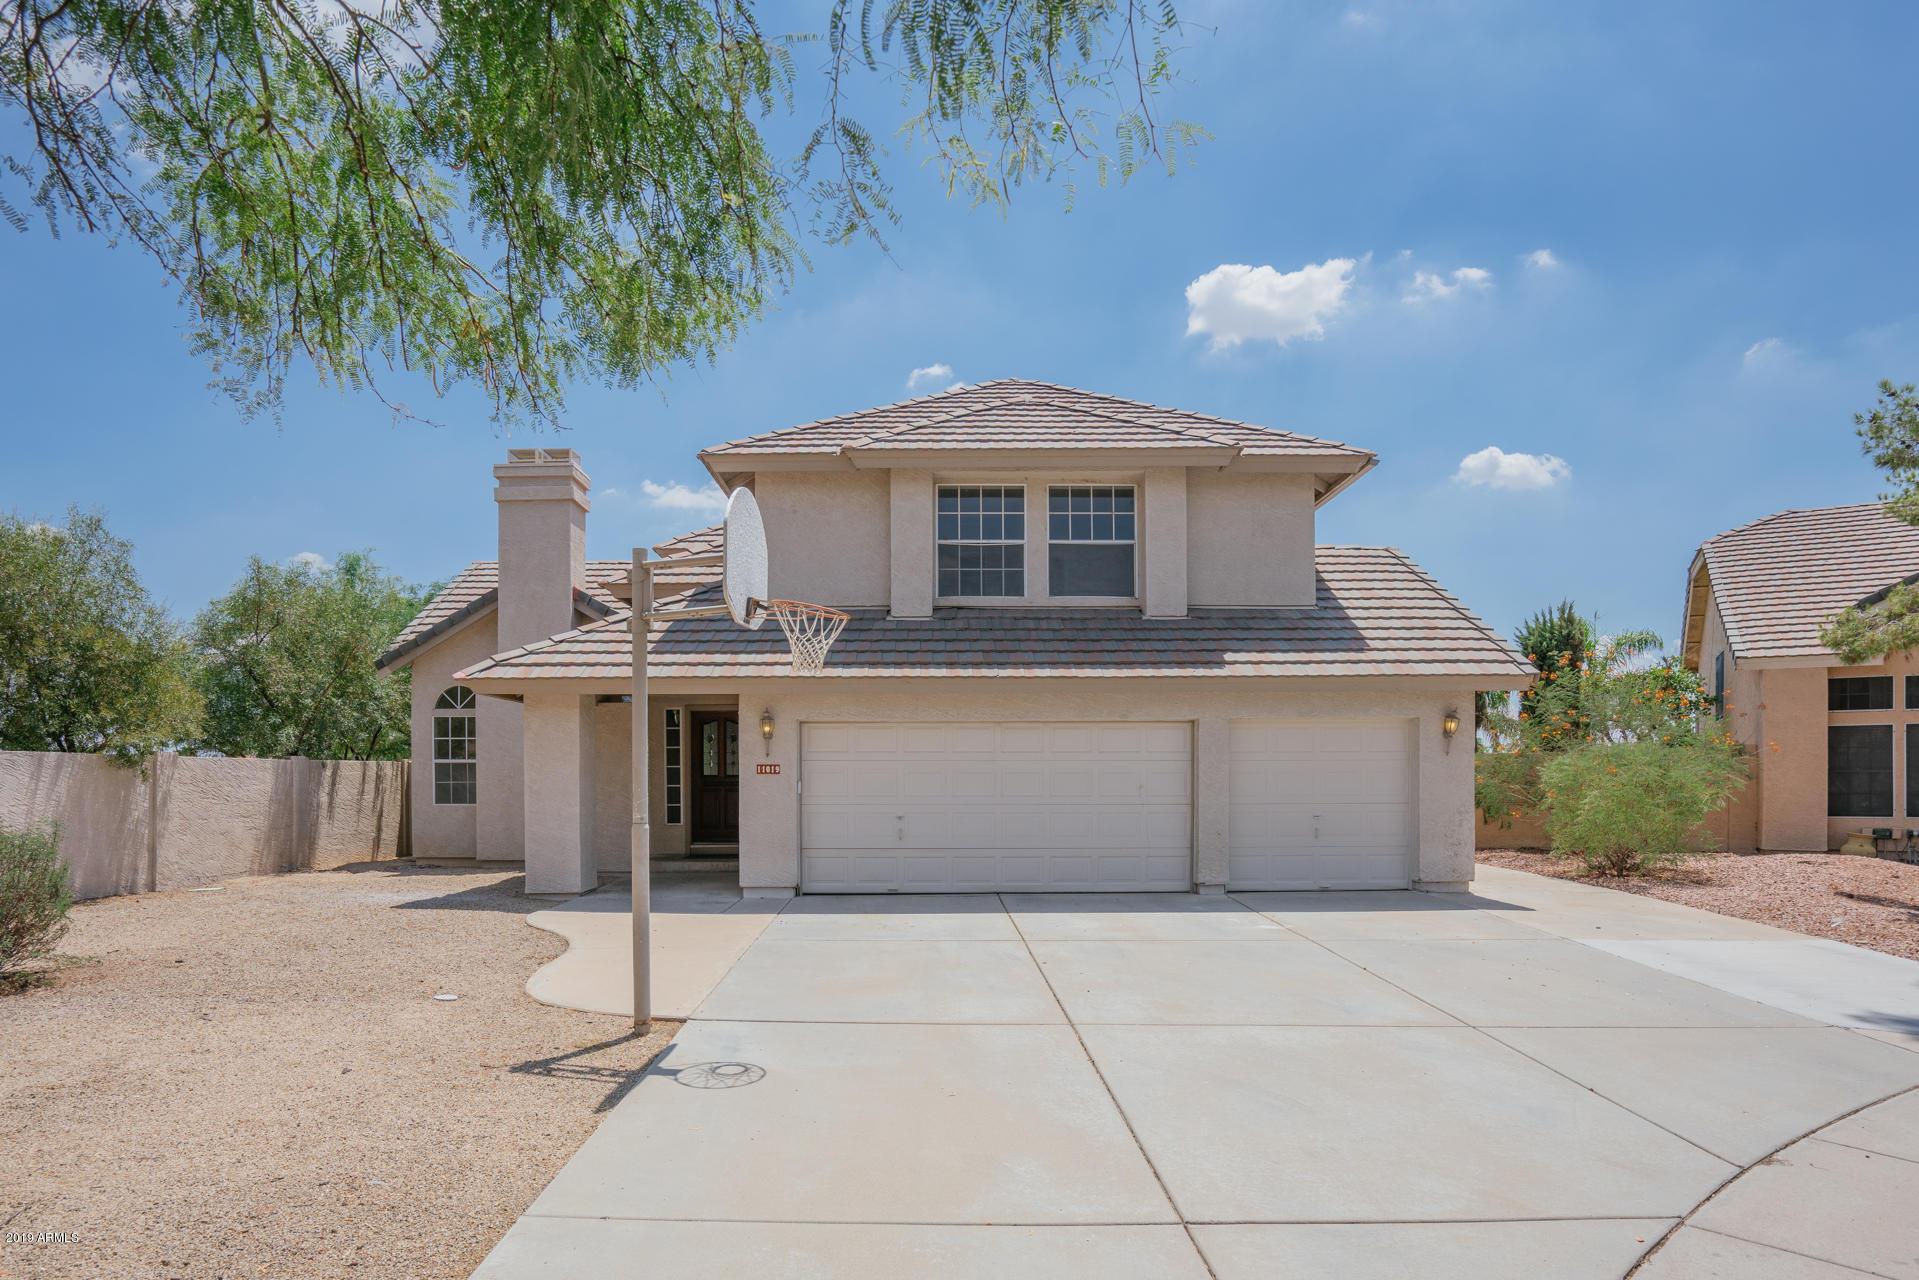 Photo of 11019 W LAURELWOOD Lane, Avondale, AZ 85392